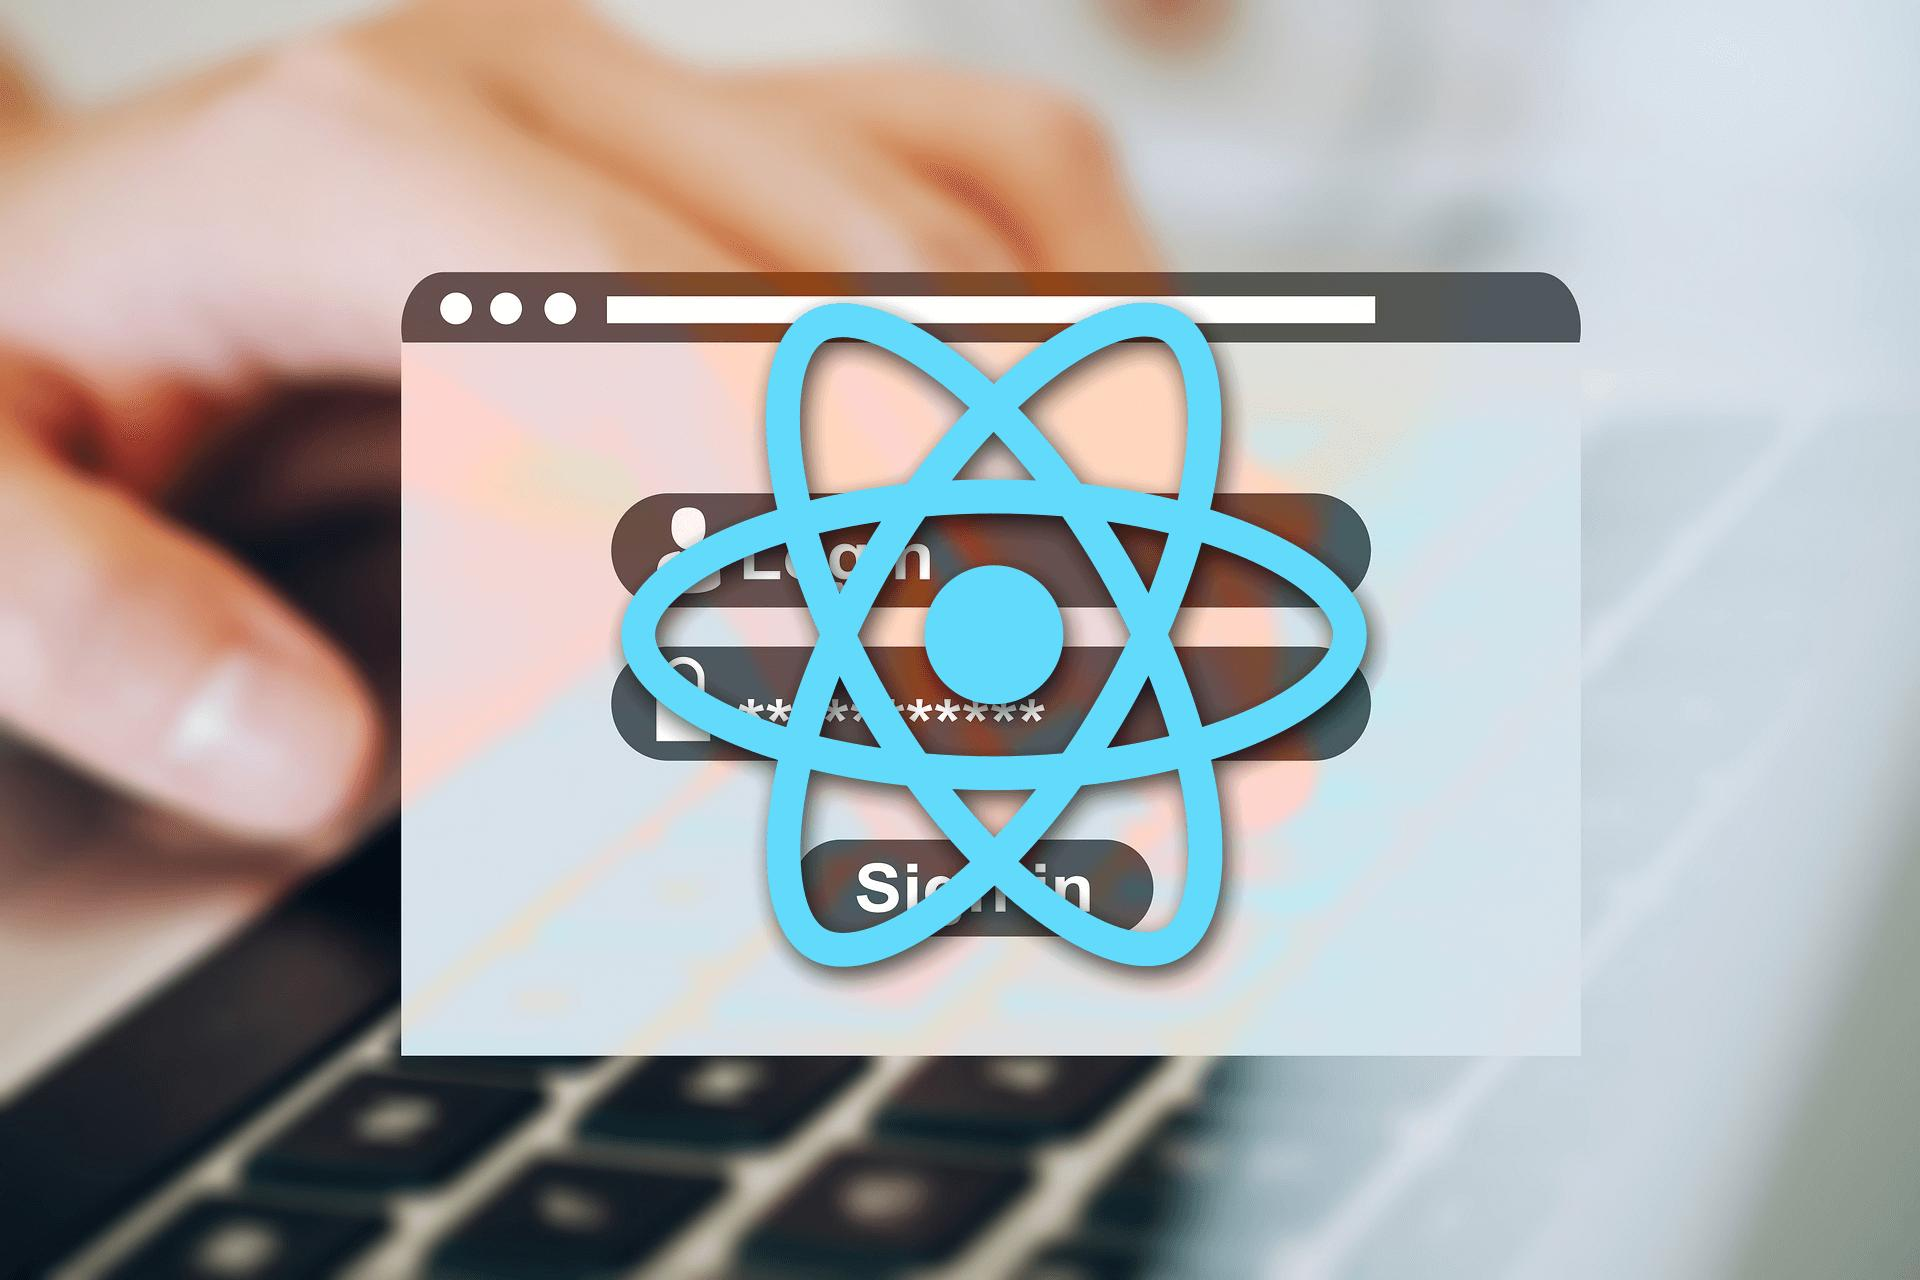 React.js форма регистрации и входа с RestAPI